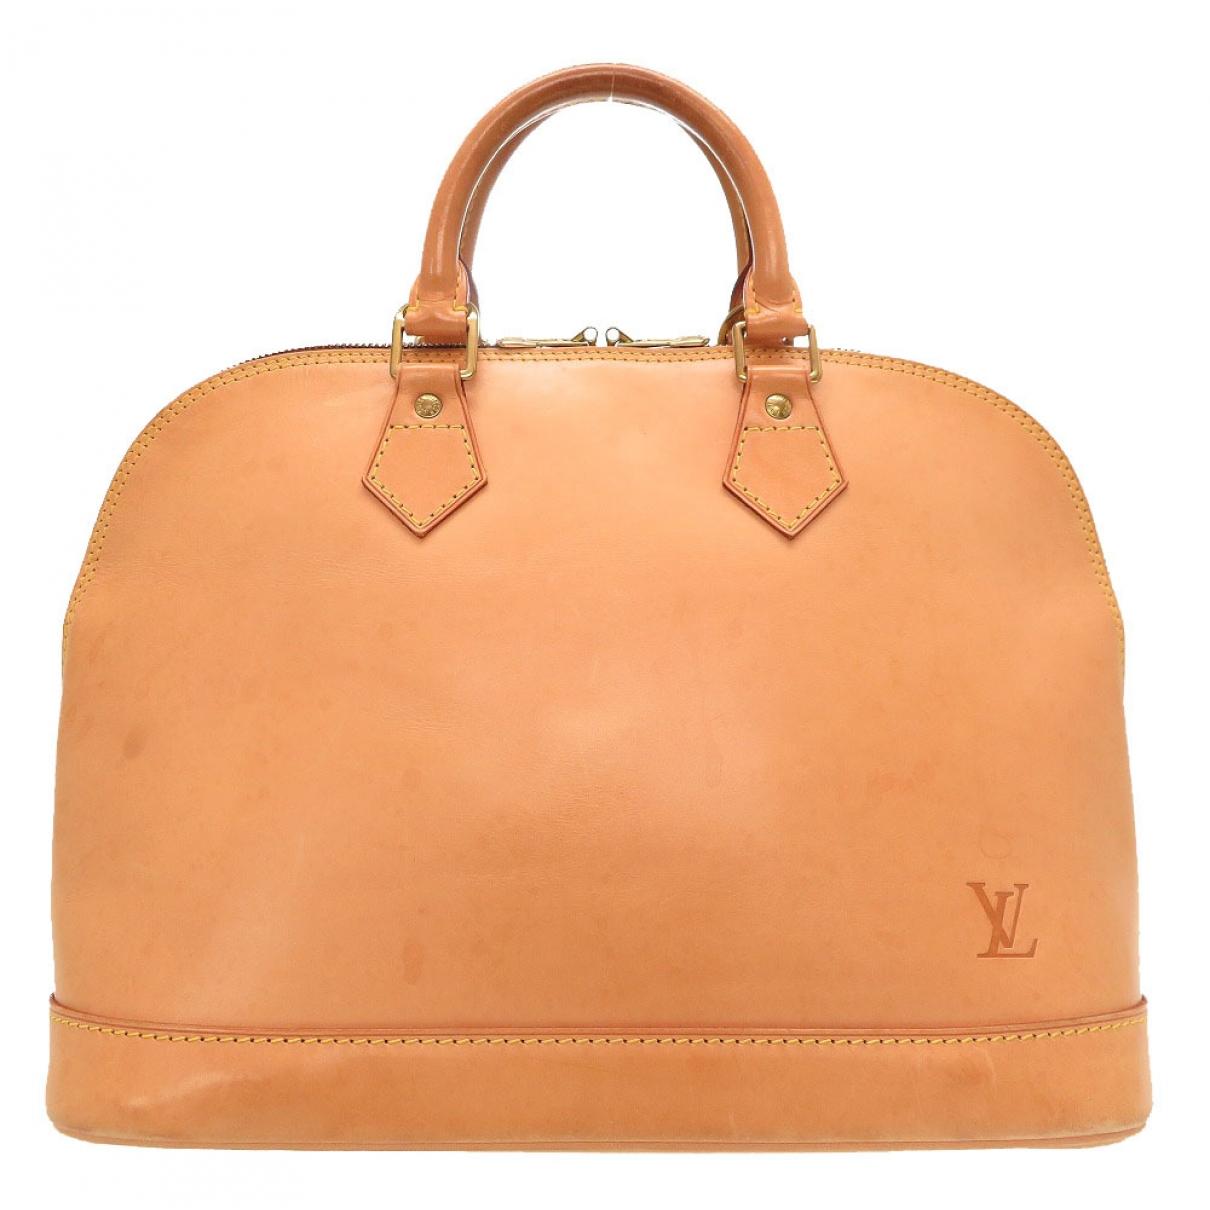 Louis Vuitton - Sac a main Alma pour femme en cuir - camel